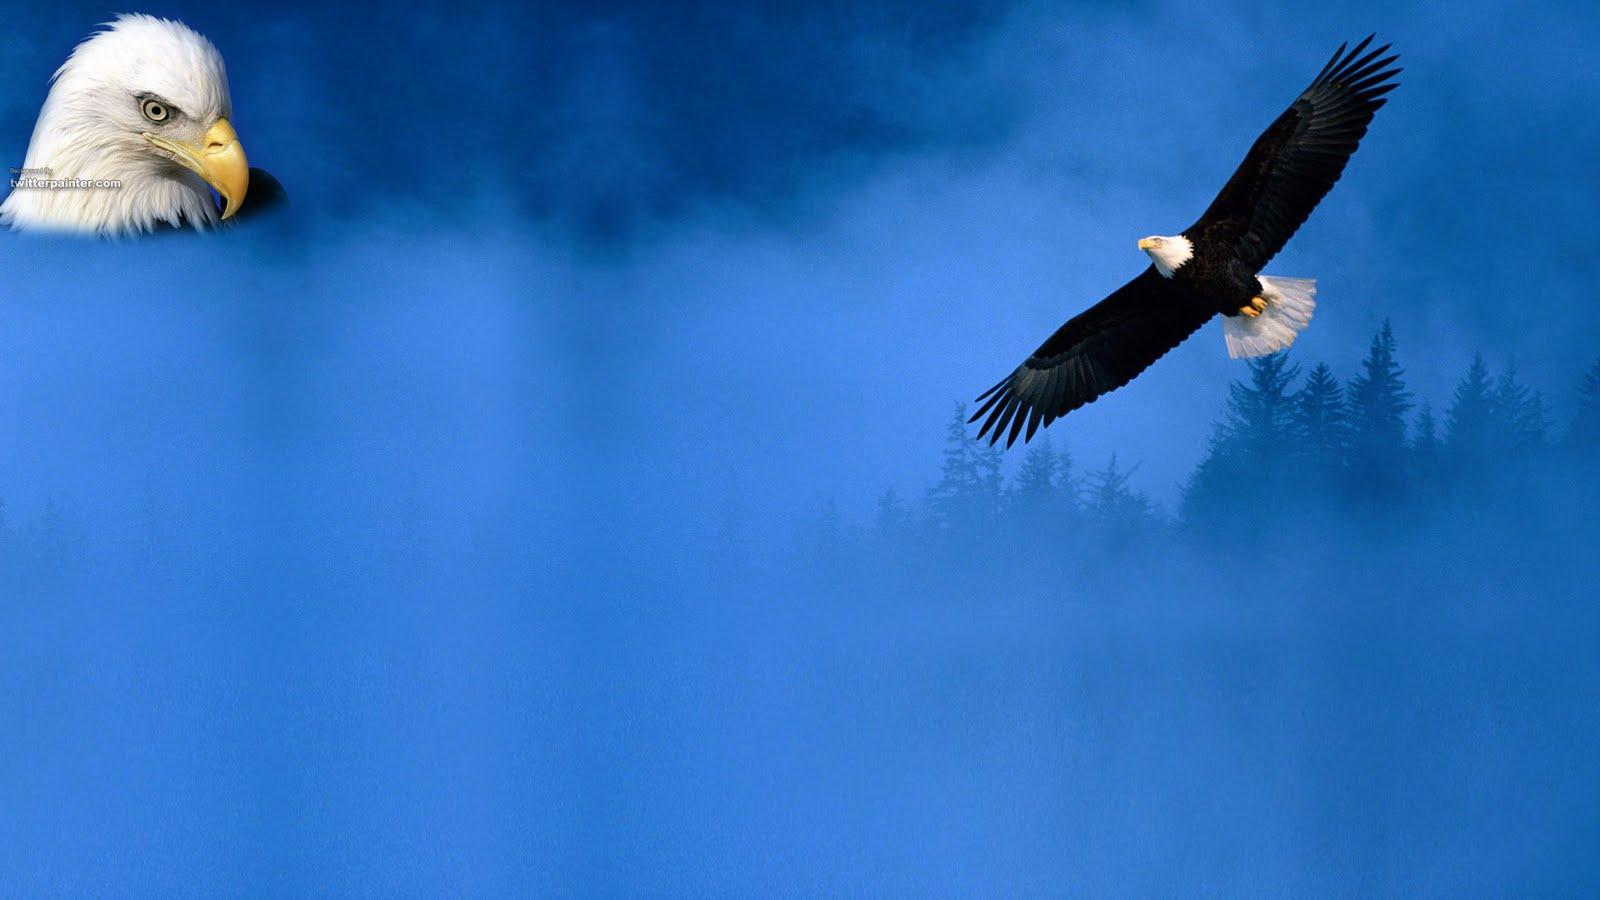 My Background Blog eagle backgrounds 1600x900